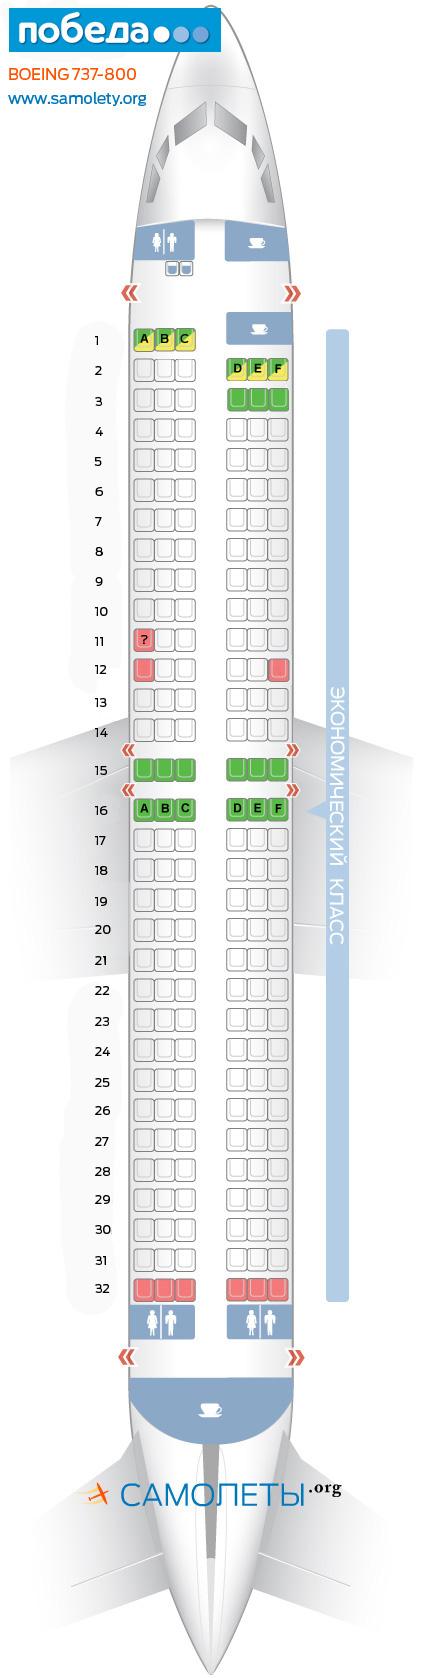 Схема салона Boeing 737-800 - Победа. Лучшие места в самолете